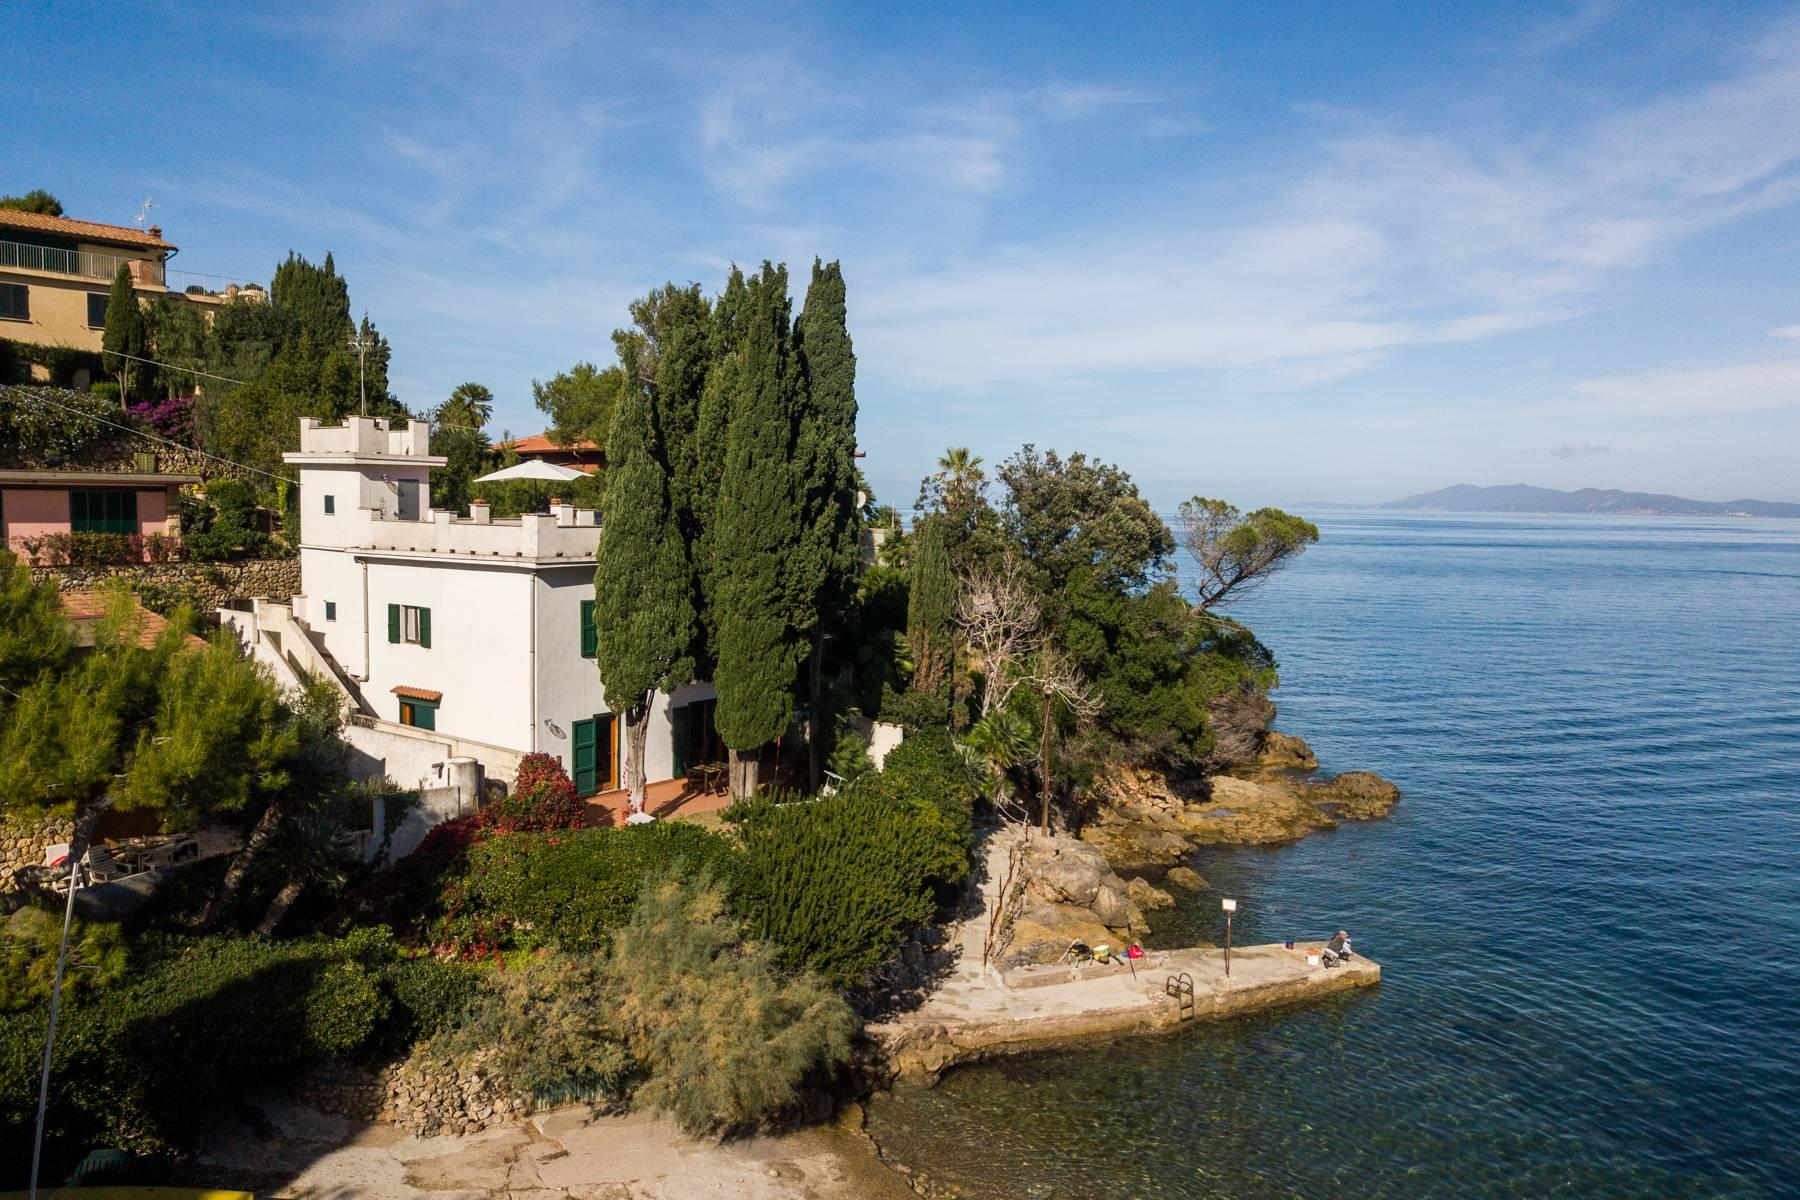 Incantevole villa pieds dans l'eau all'Argentario - 2